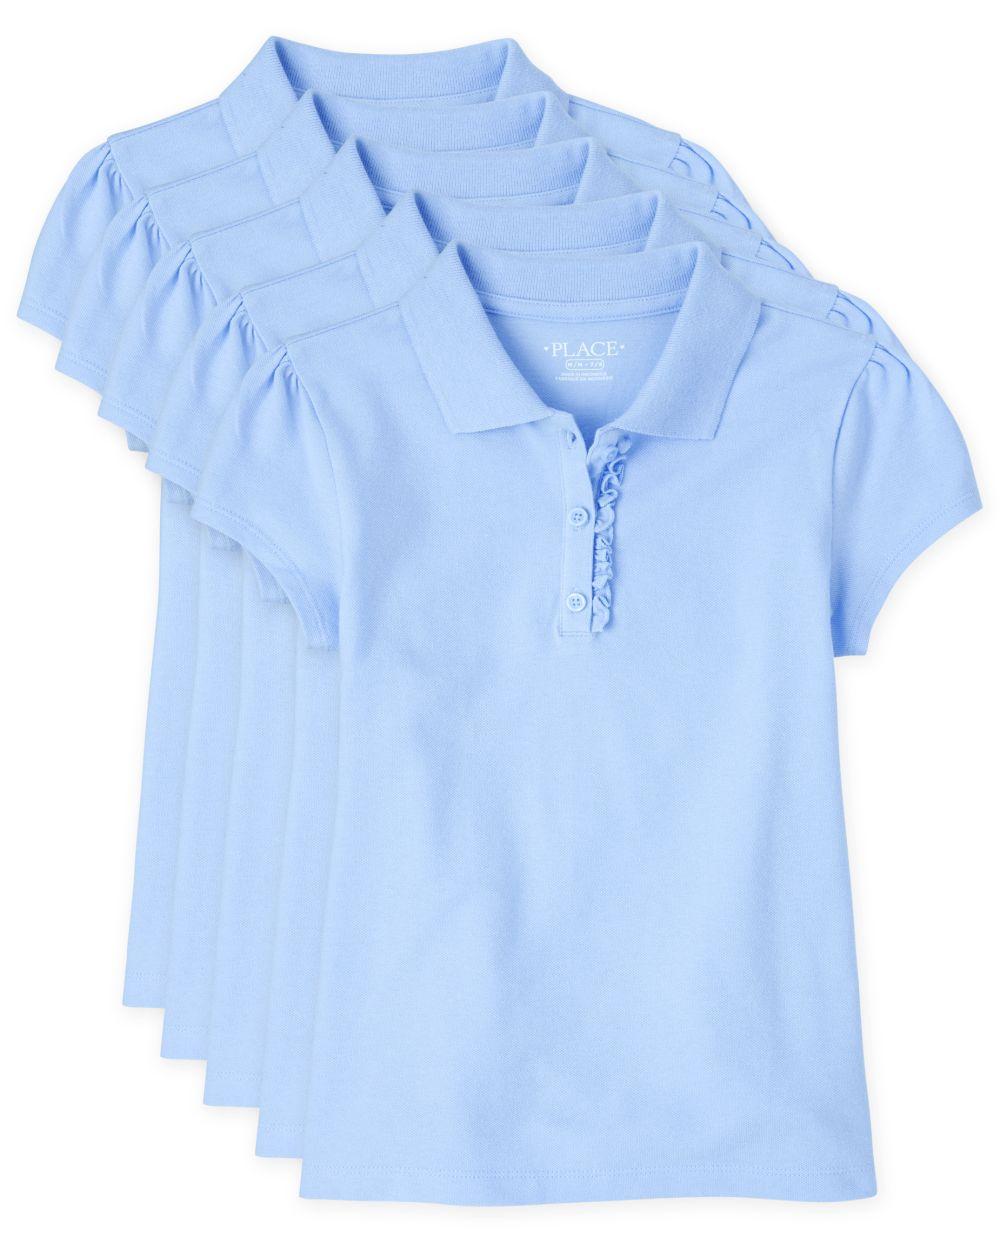 Girls Uniform Ruffle Pique Polo 5-Pack